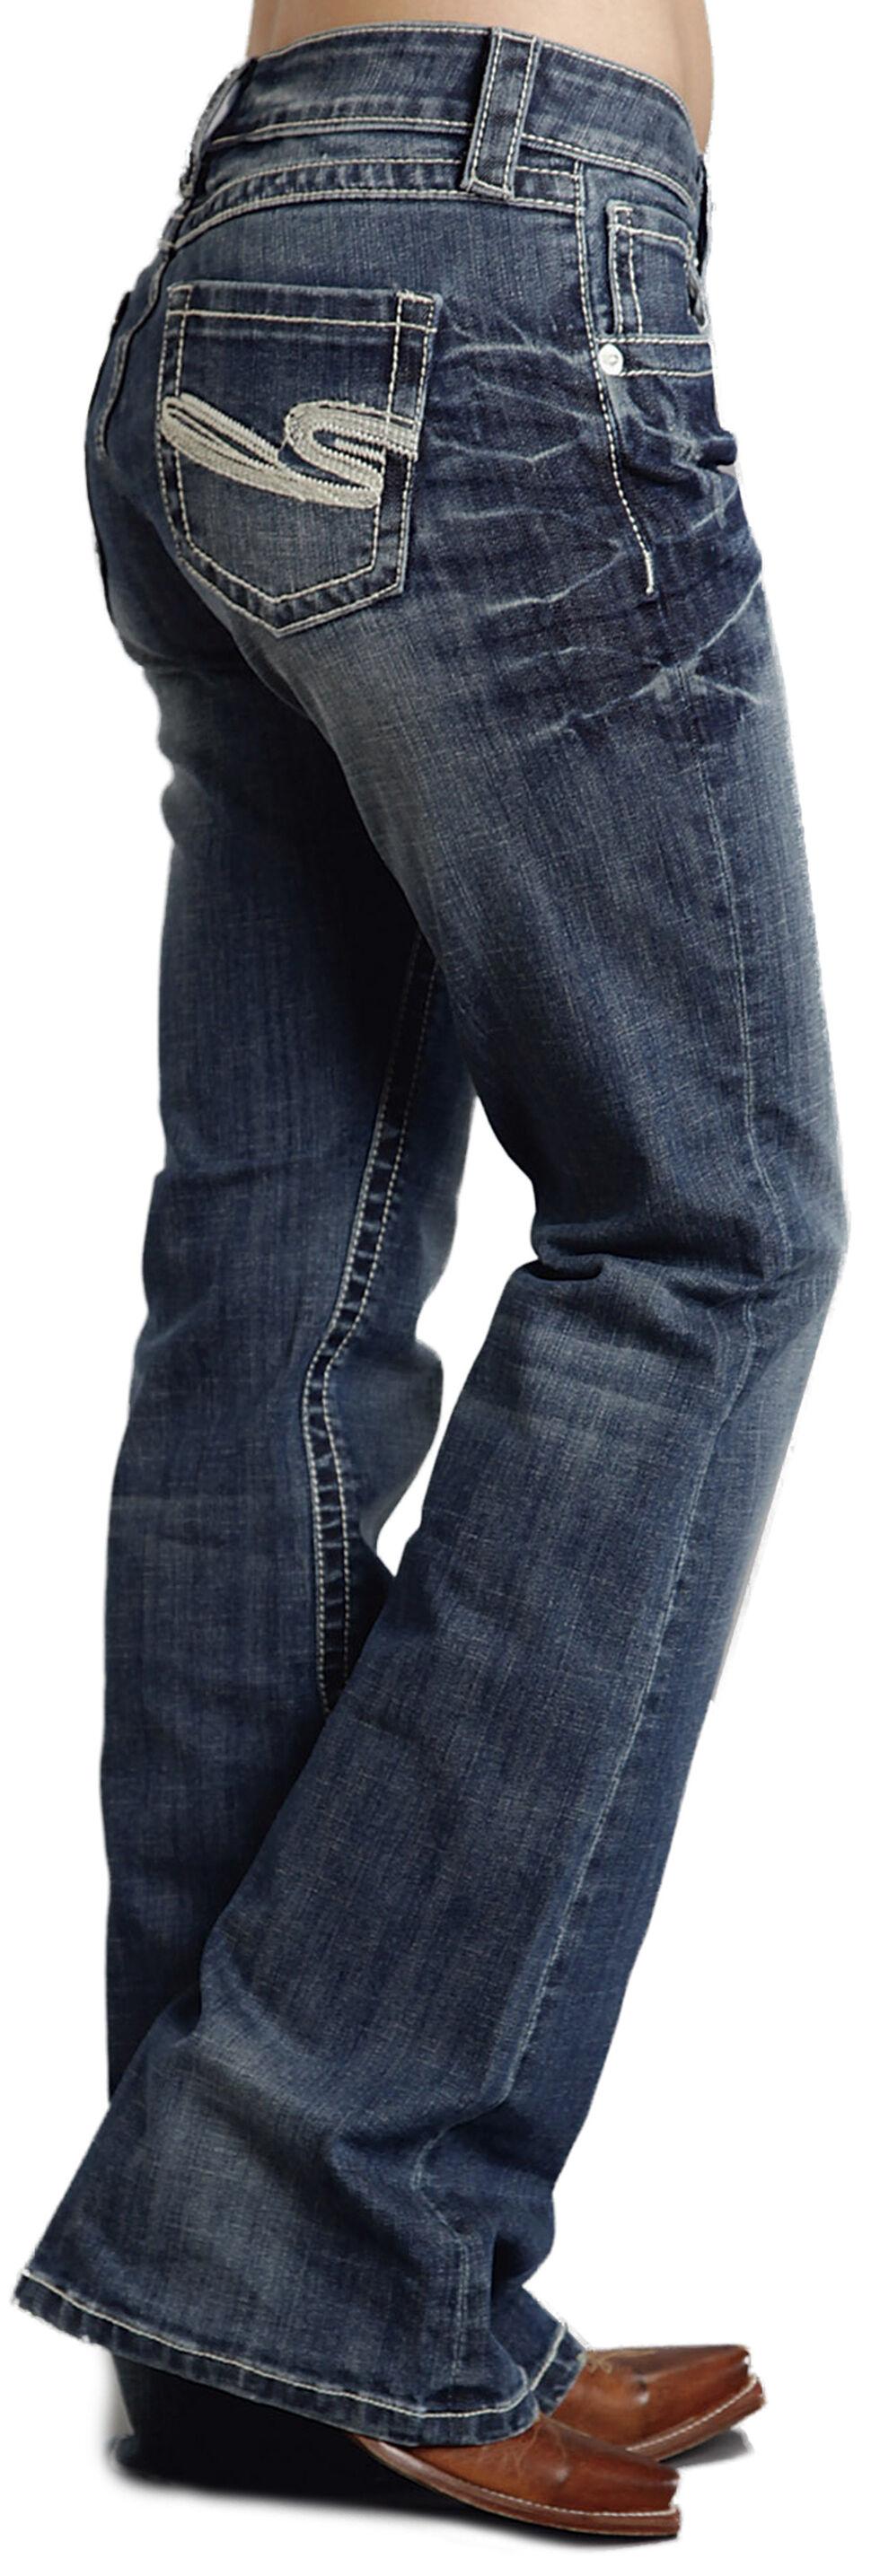 "Stetson Women's 816 Fit White ""S"" Stitch Bootcut Jeans - Plus, , hi-res"